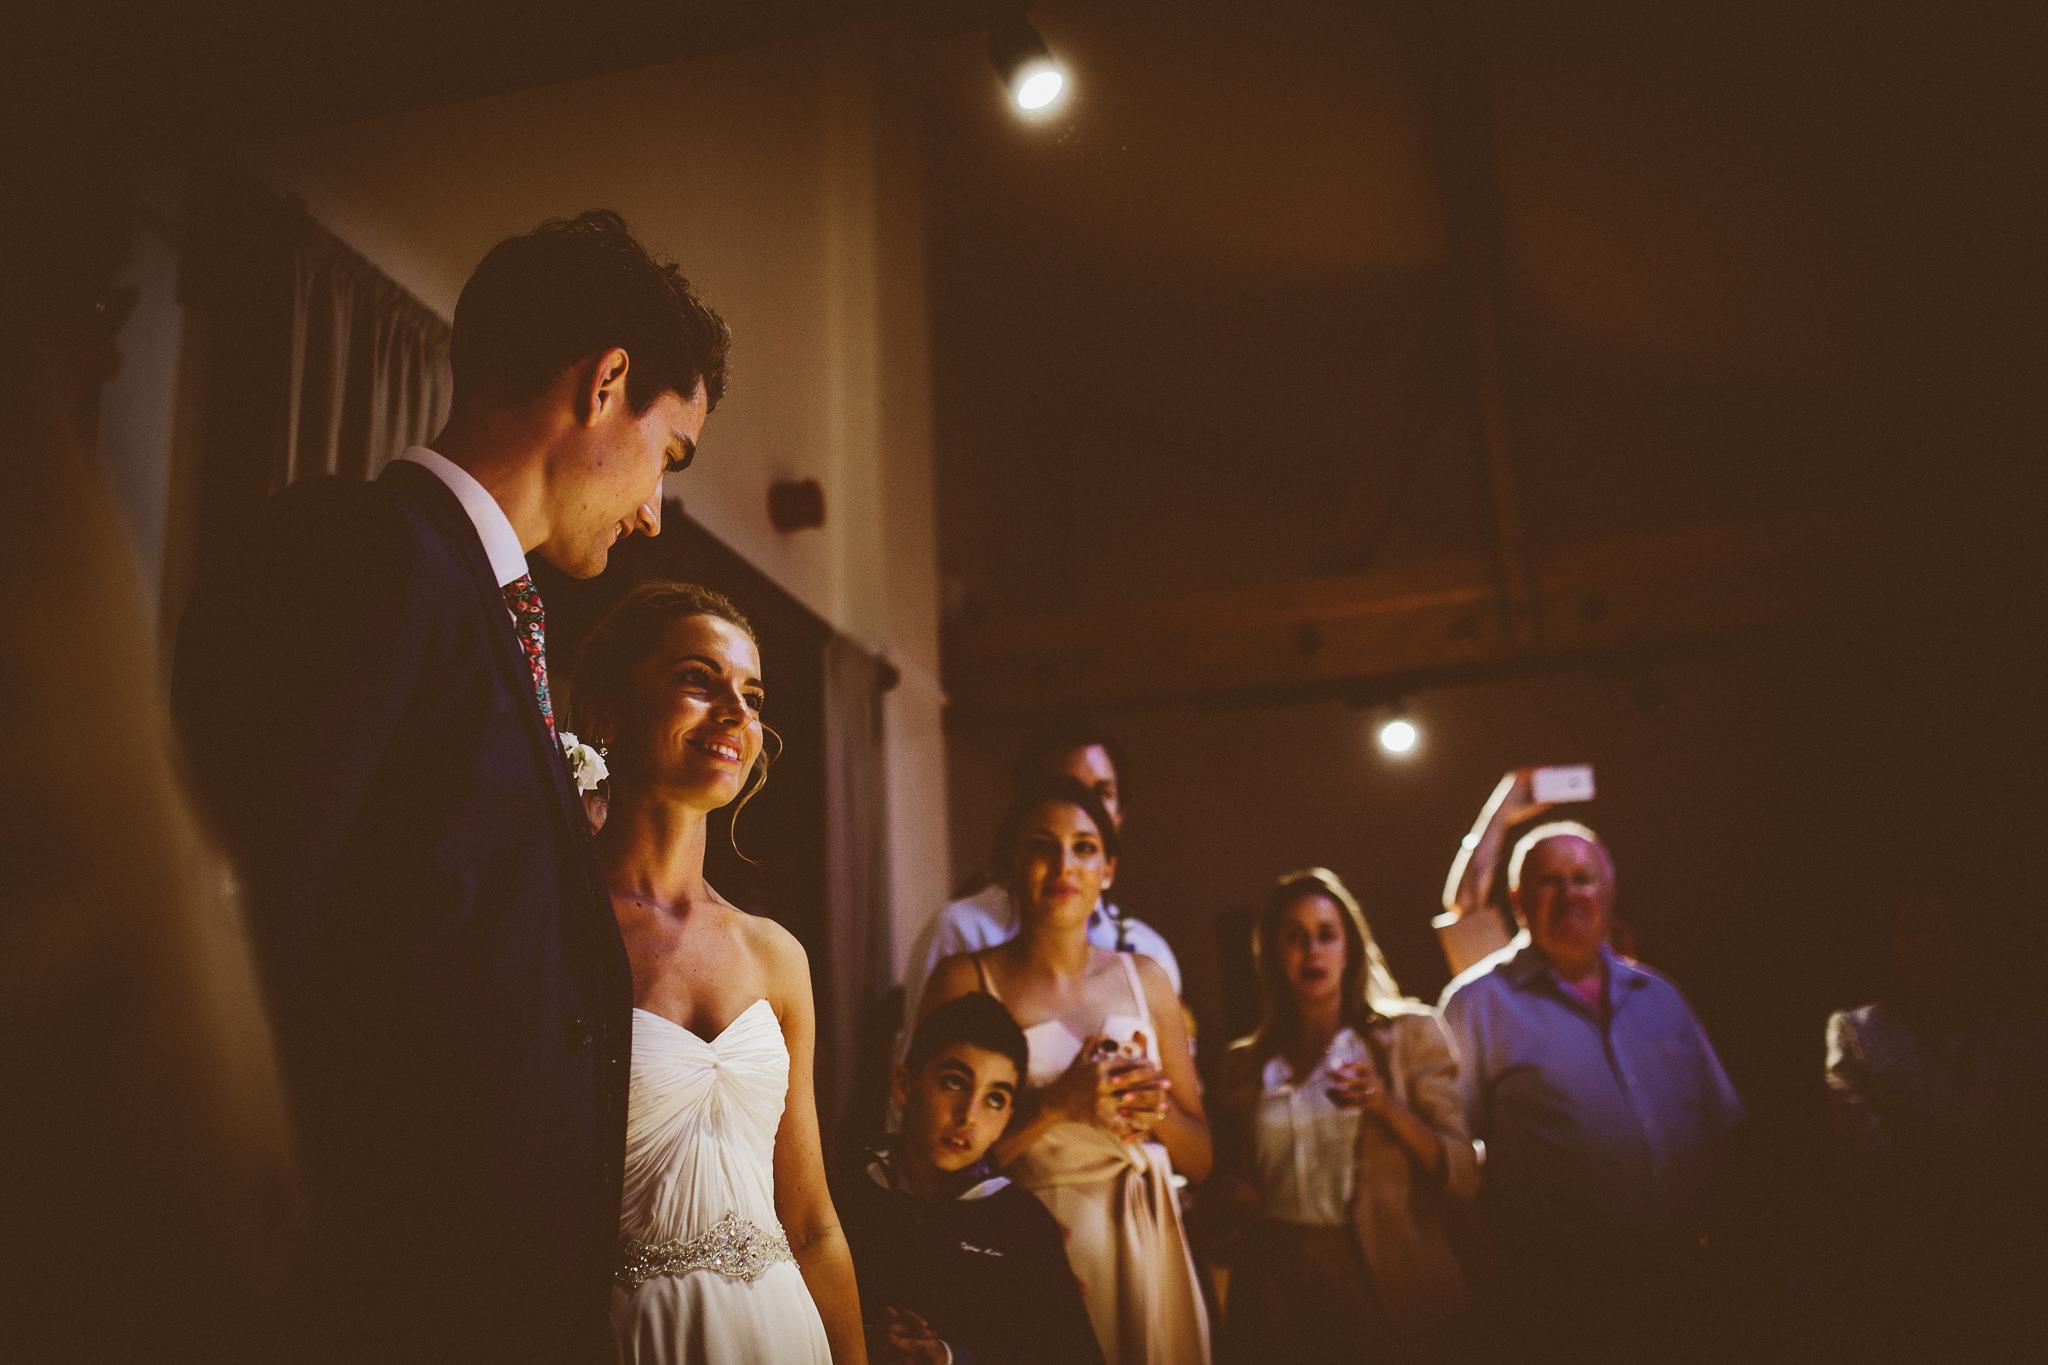 paul-marbrook-Gaynes-Park Wedding-Photographer-90137